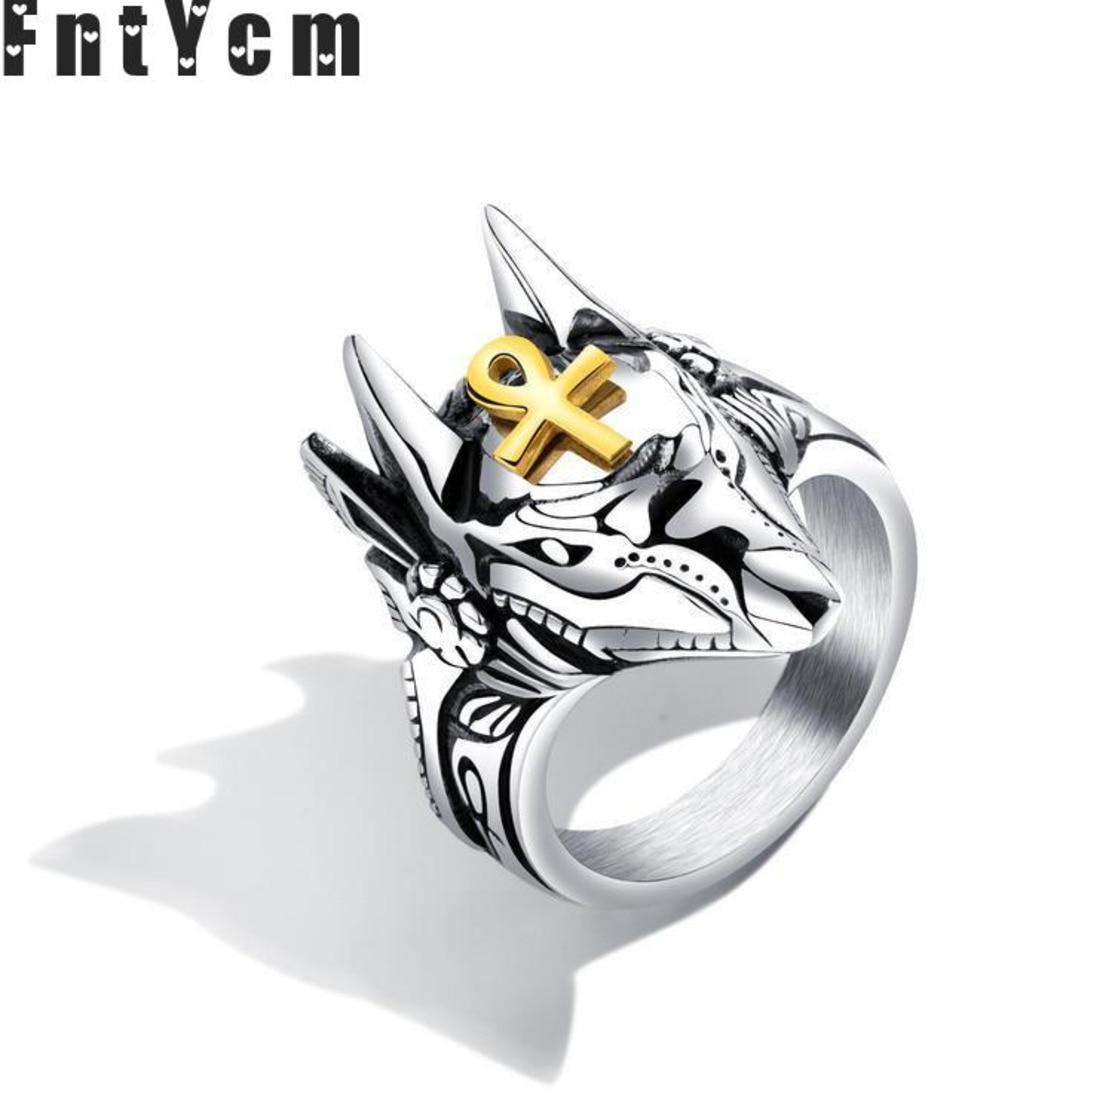 cc9520c7508f Anubis Egipto anillo Anillos de acero inoxidable para los hombres de plata  Punk Mens Anillos Bague hombre Anel Masculino de la joyería